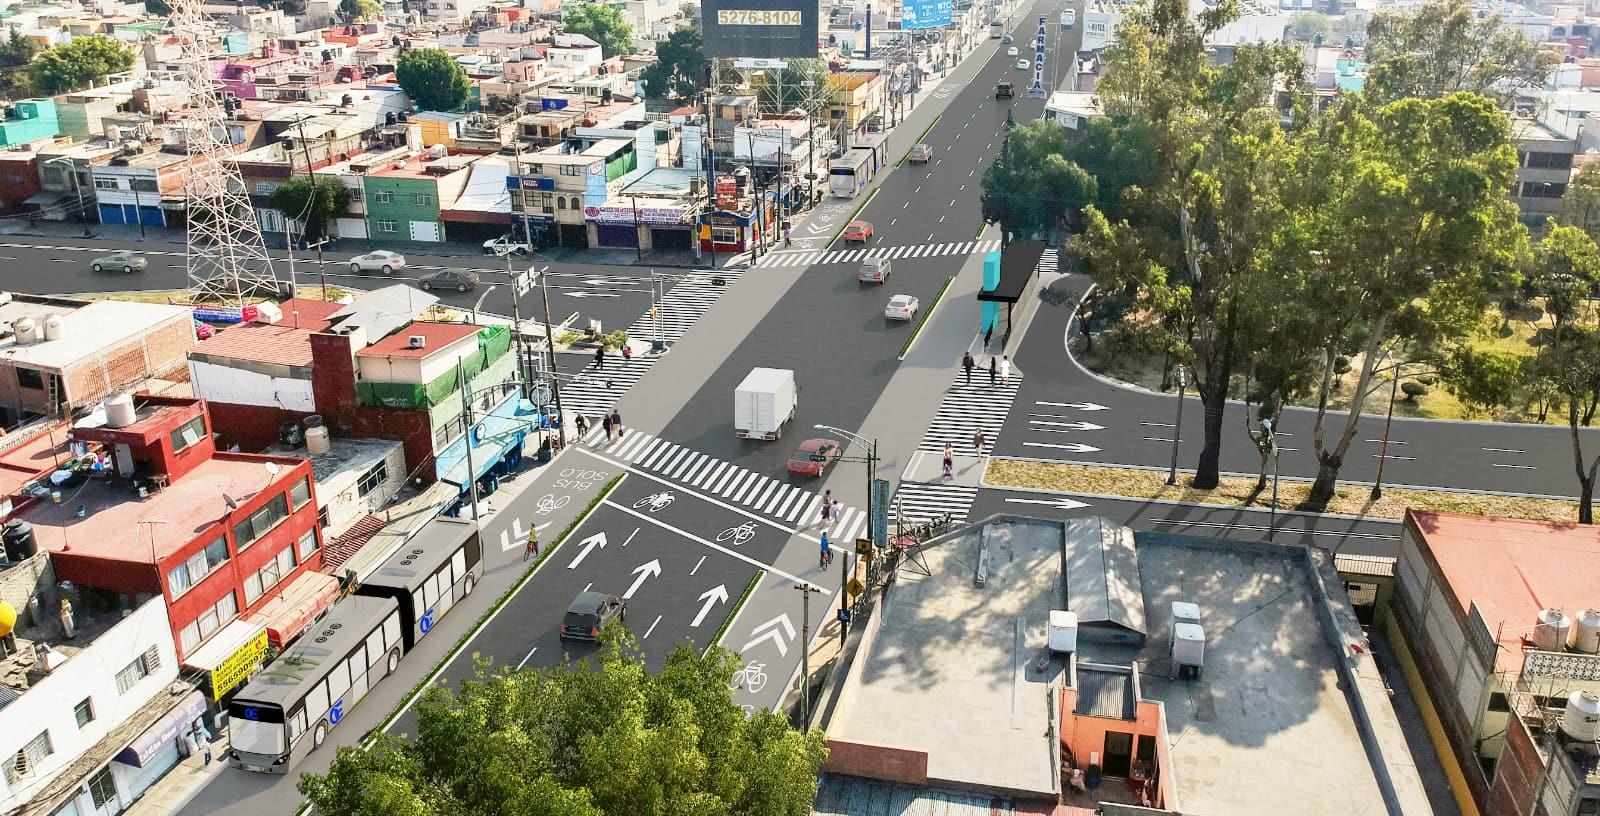 IDOM_Eje8Sur_Mexico3-min